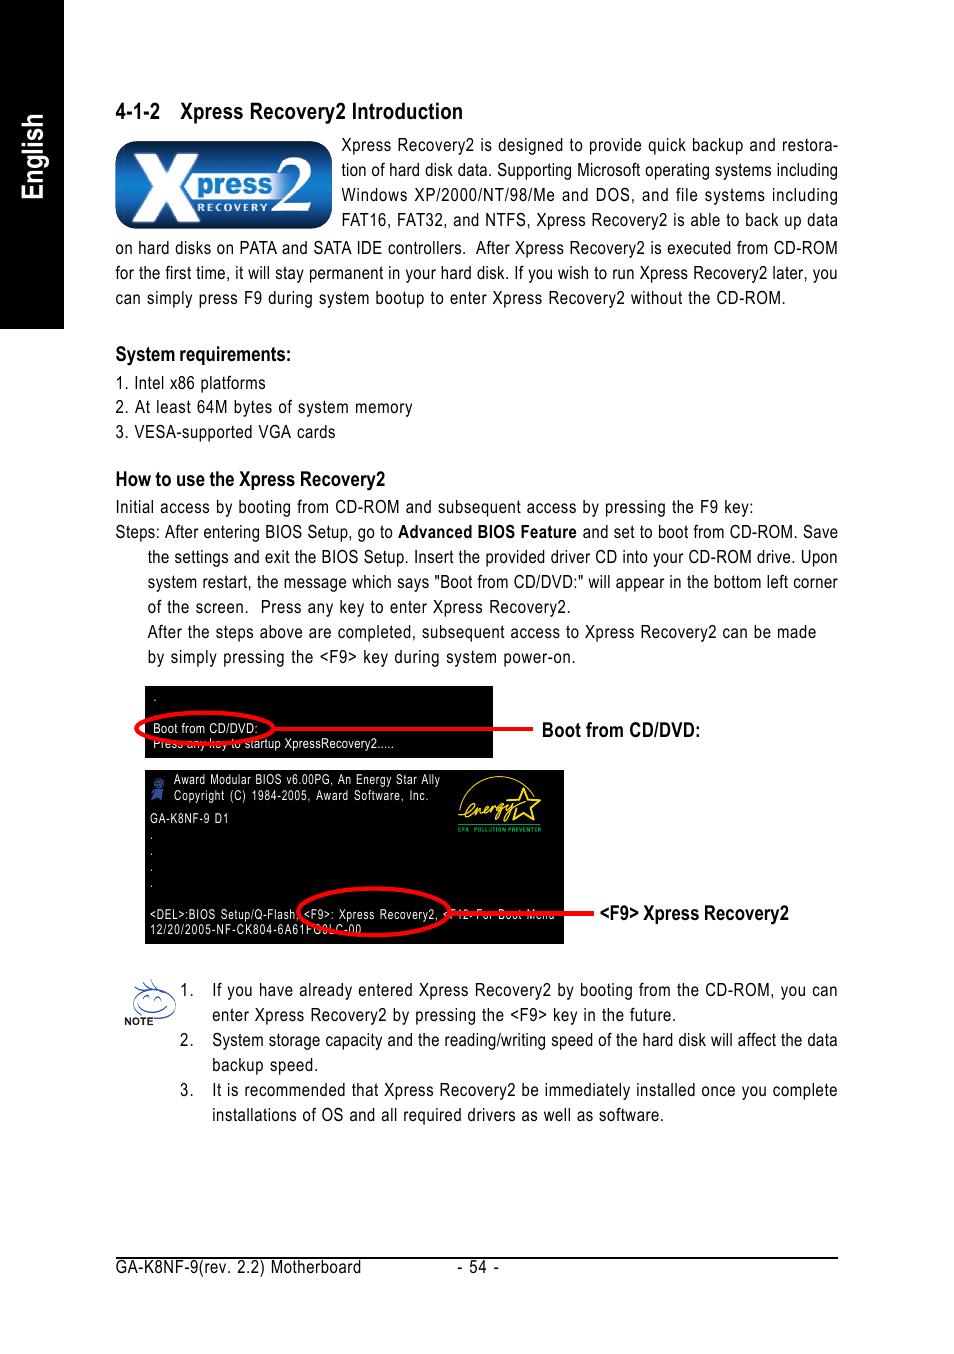 English, 1-2 xpress recovery2 introduction | GIGABYTE GA